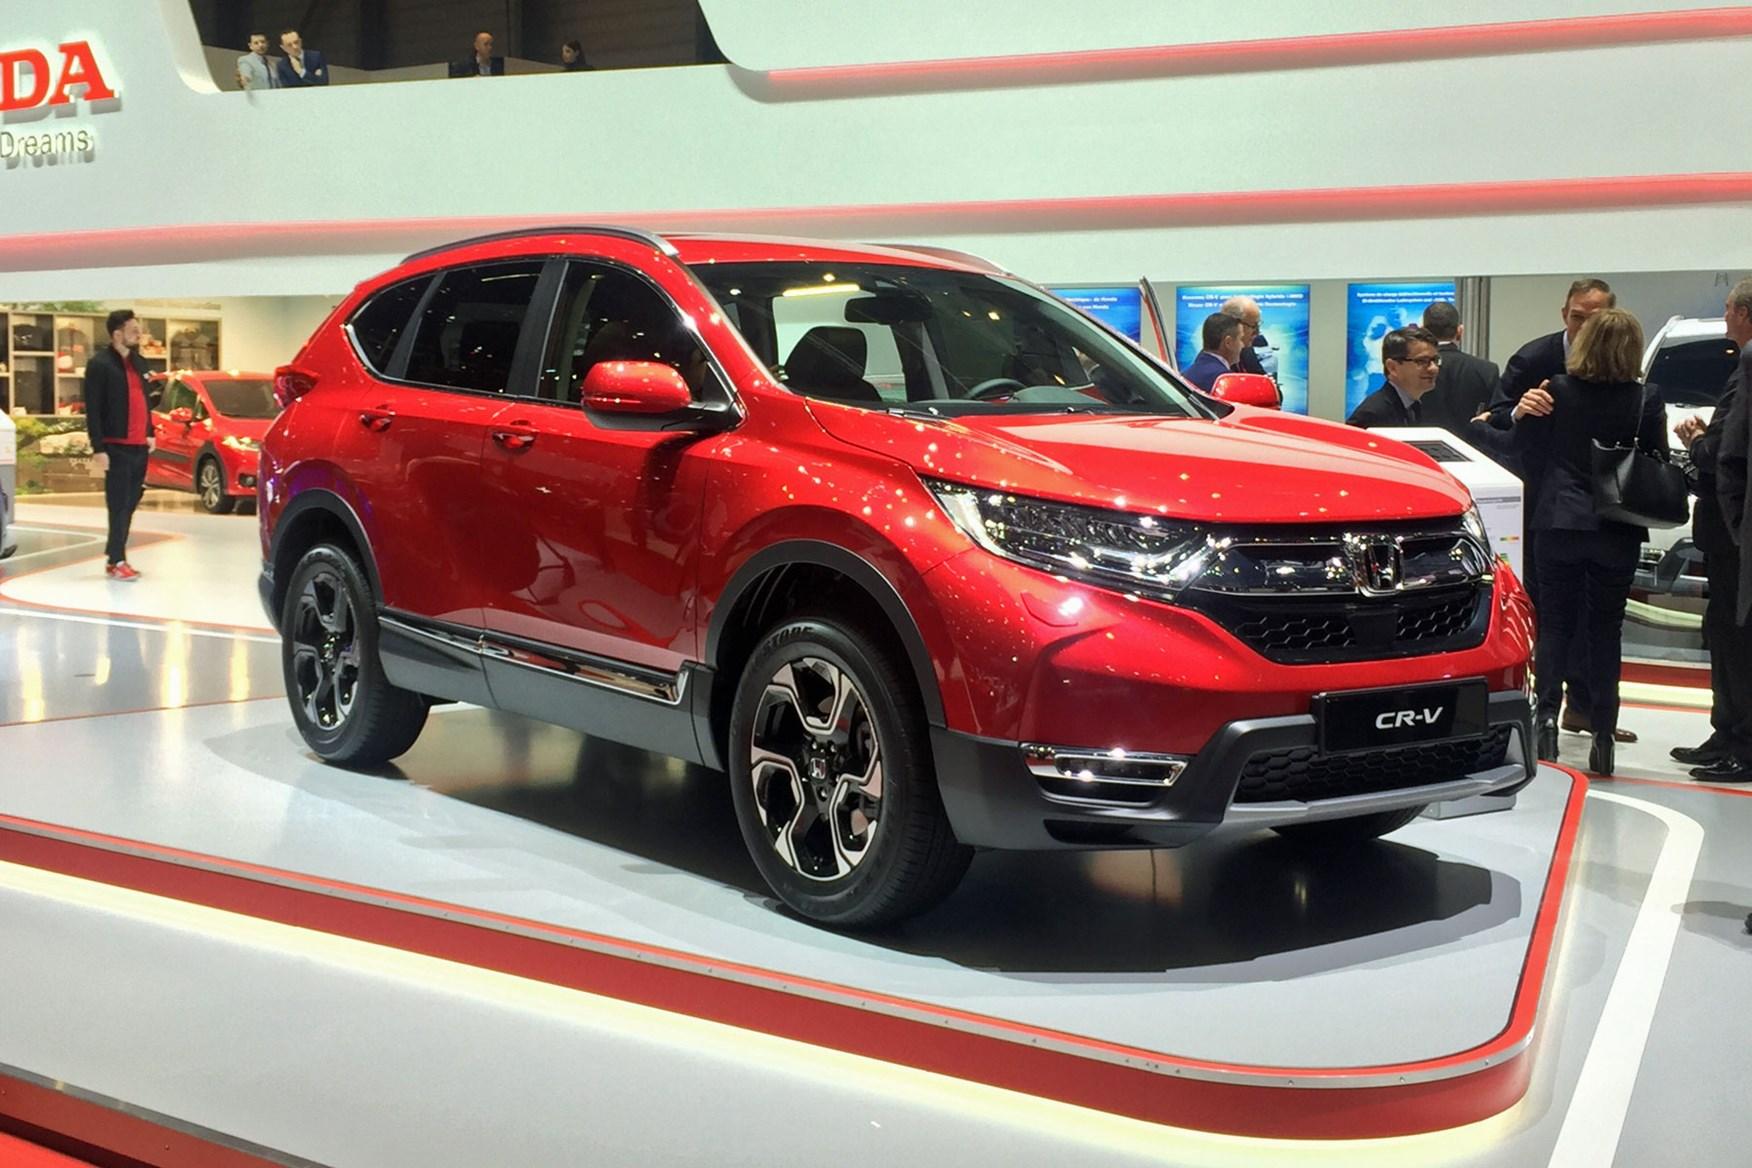 Honda Crv All Wheel Drive >> Honda CR-V (2018): news, info, pics, spec, hybrid | CAR Magazine